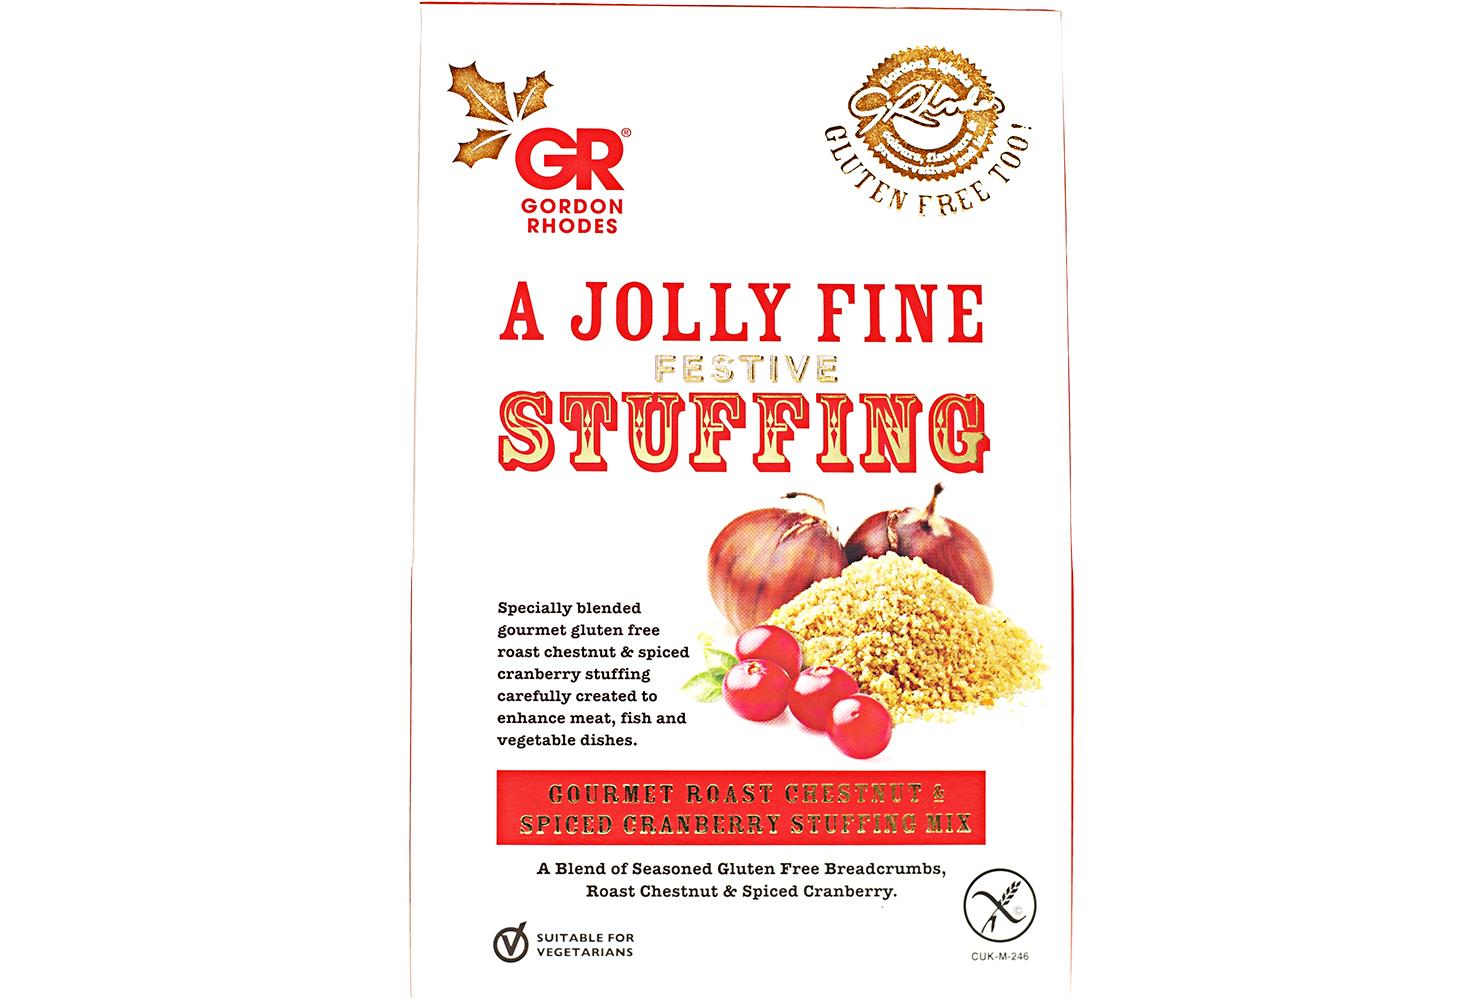 GR GLUTEN FREE ROAST CHESTNUT & SPICED CRANBERRY STUFFING MIX